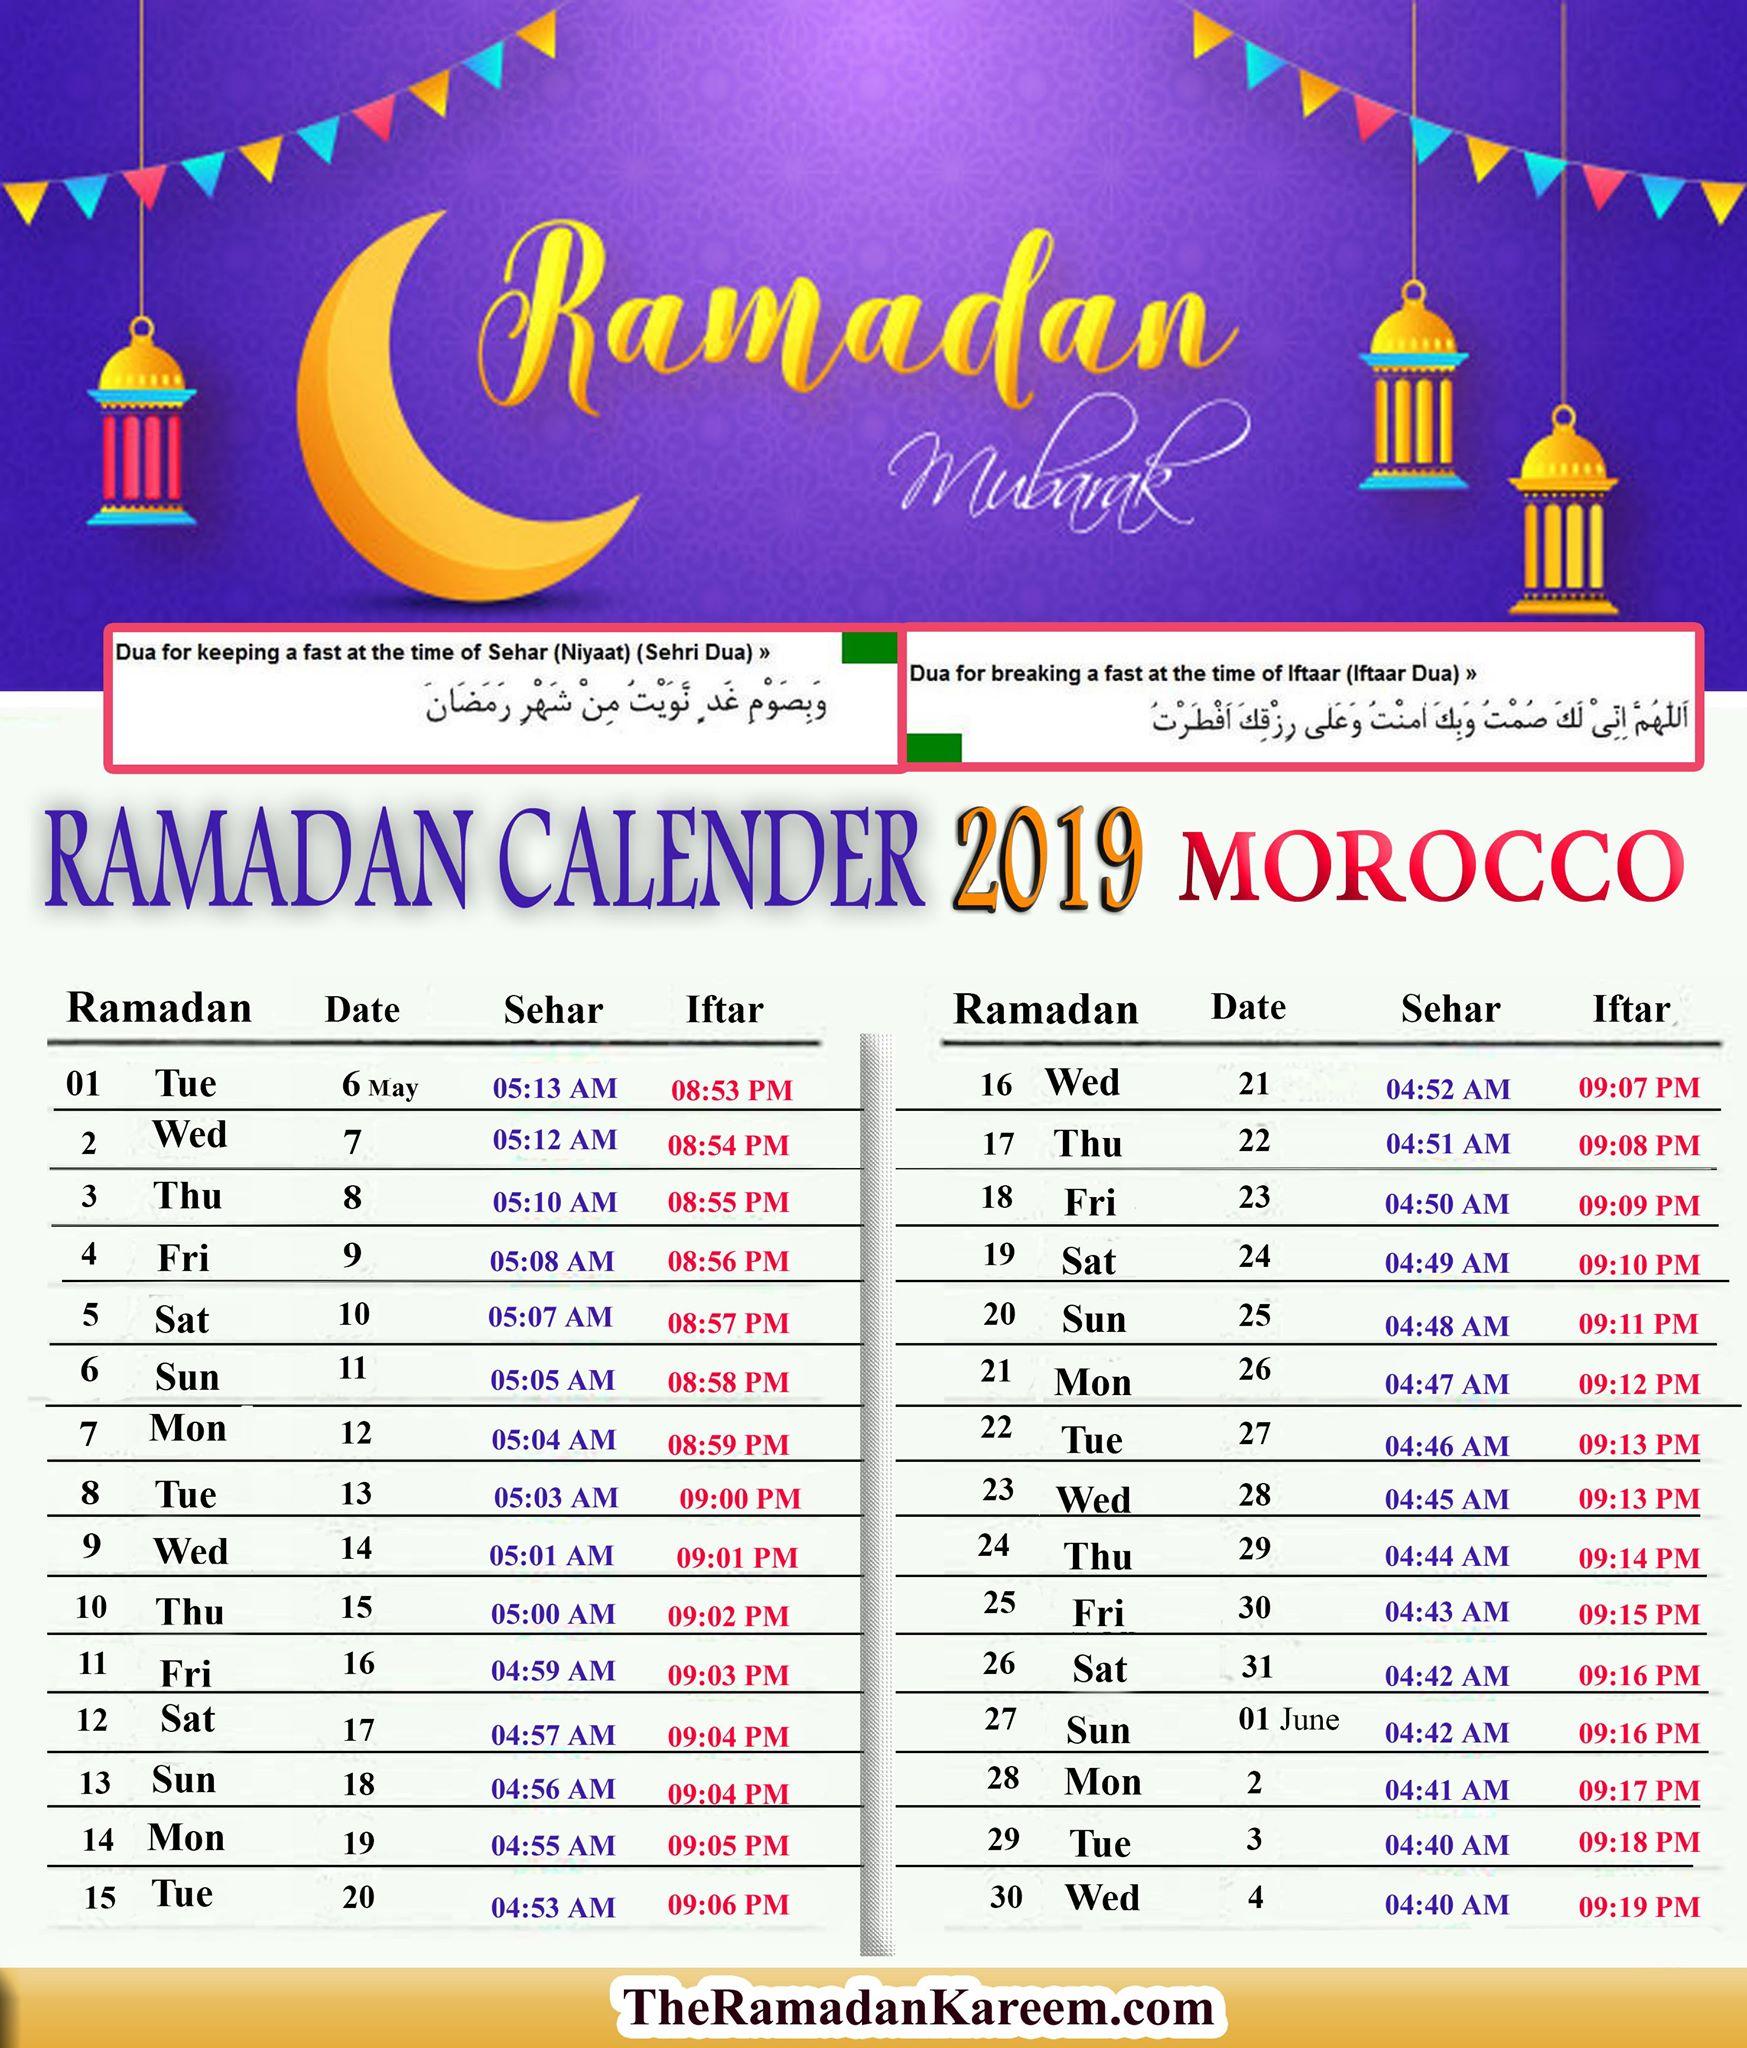 Morocco Ramadan Timetable Calendar Download 2019 PDF IMAGE